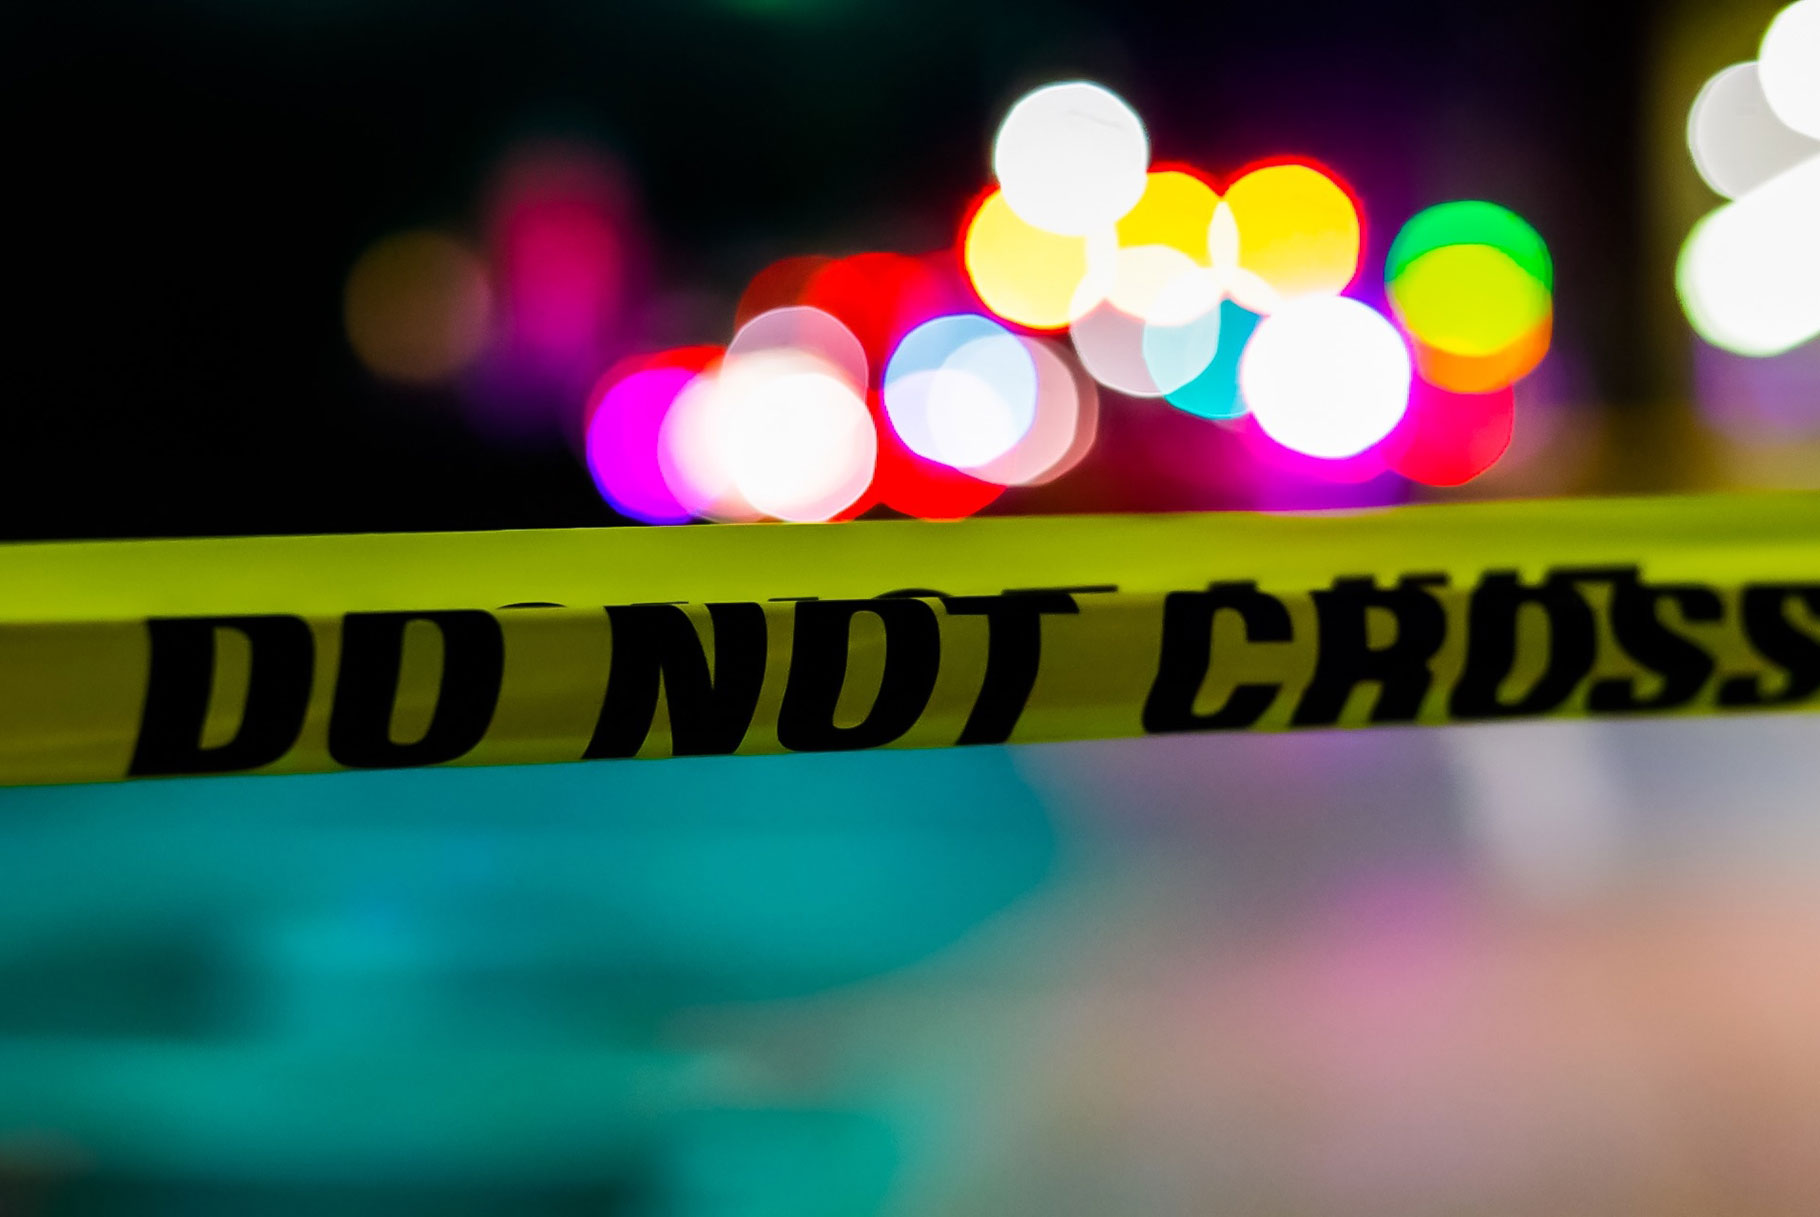 'Era un superhéroe': maestro de California asesinado a balazos mientras aceleraba después de Mystery Shooters